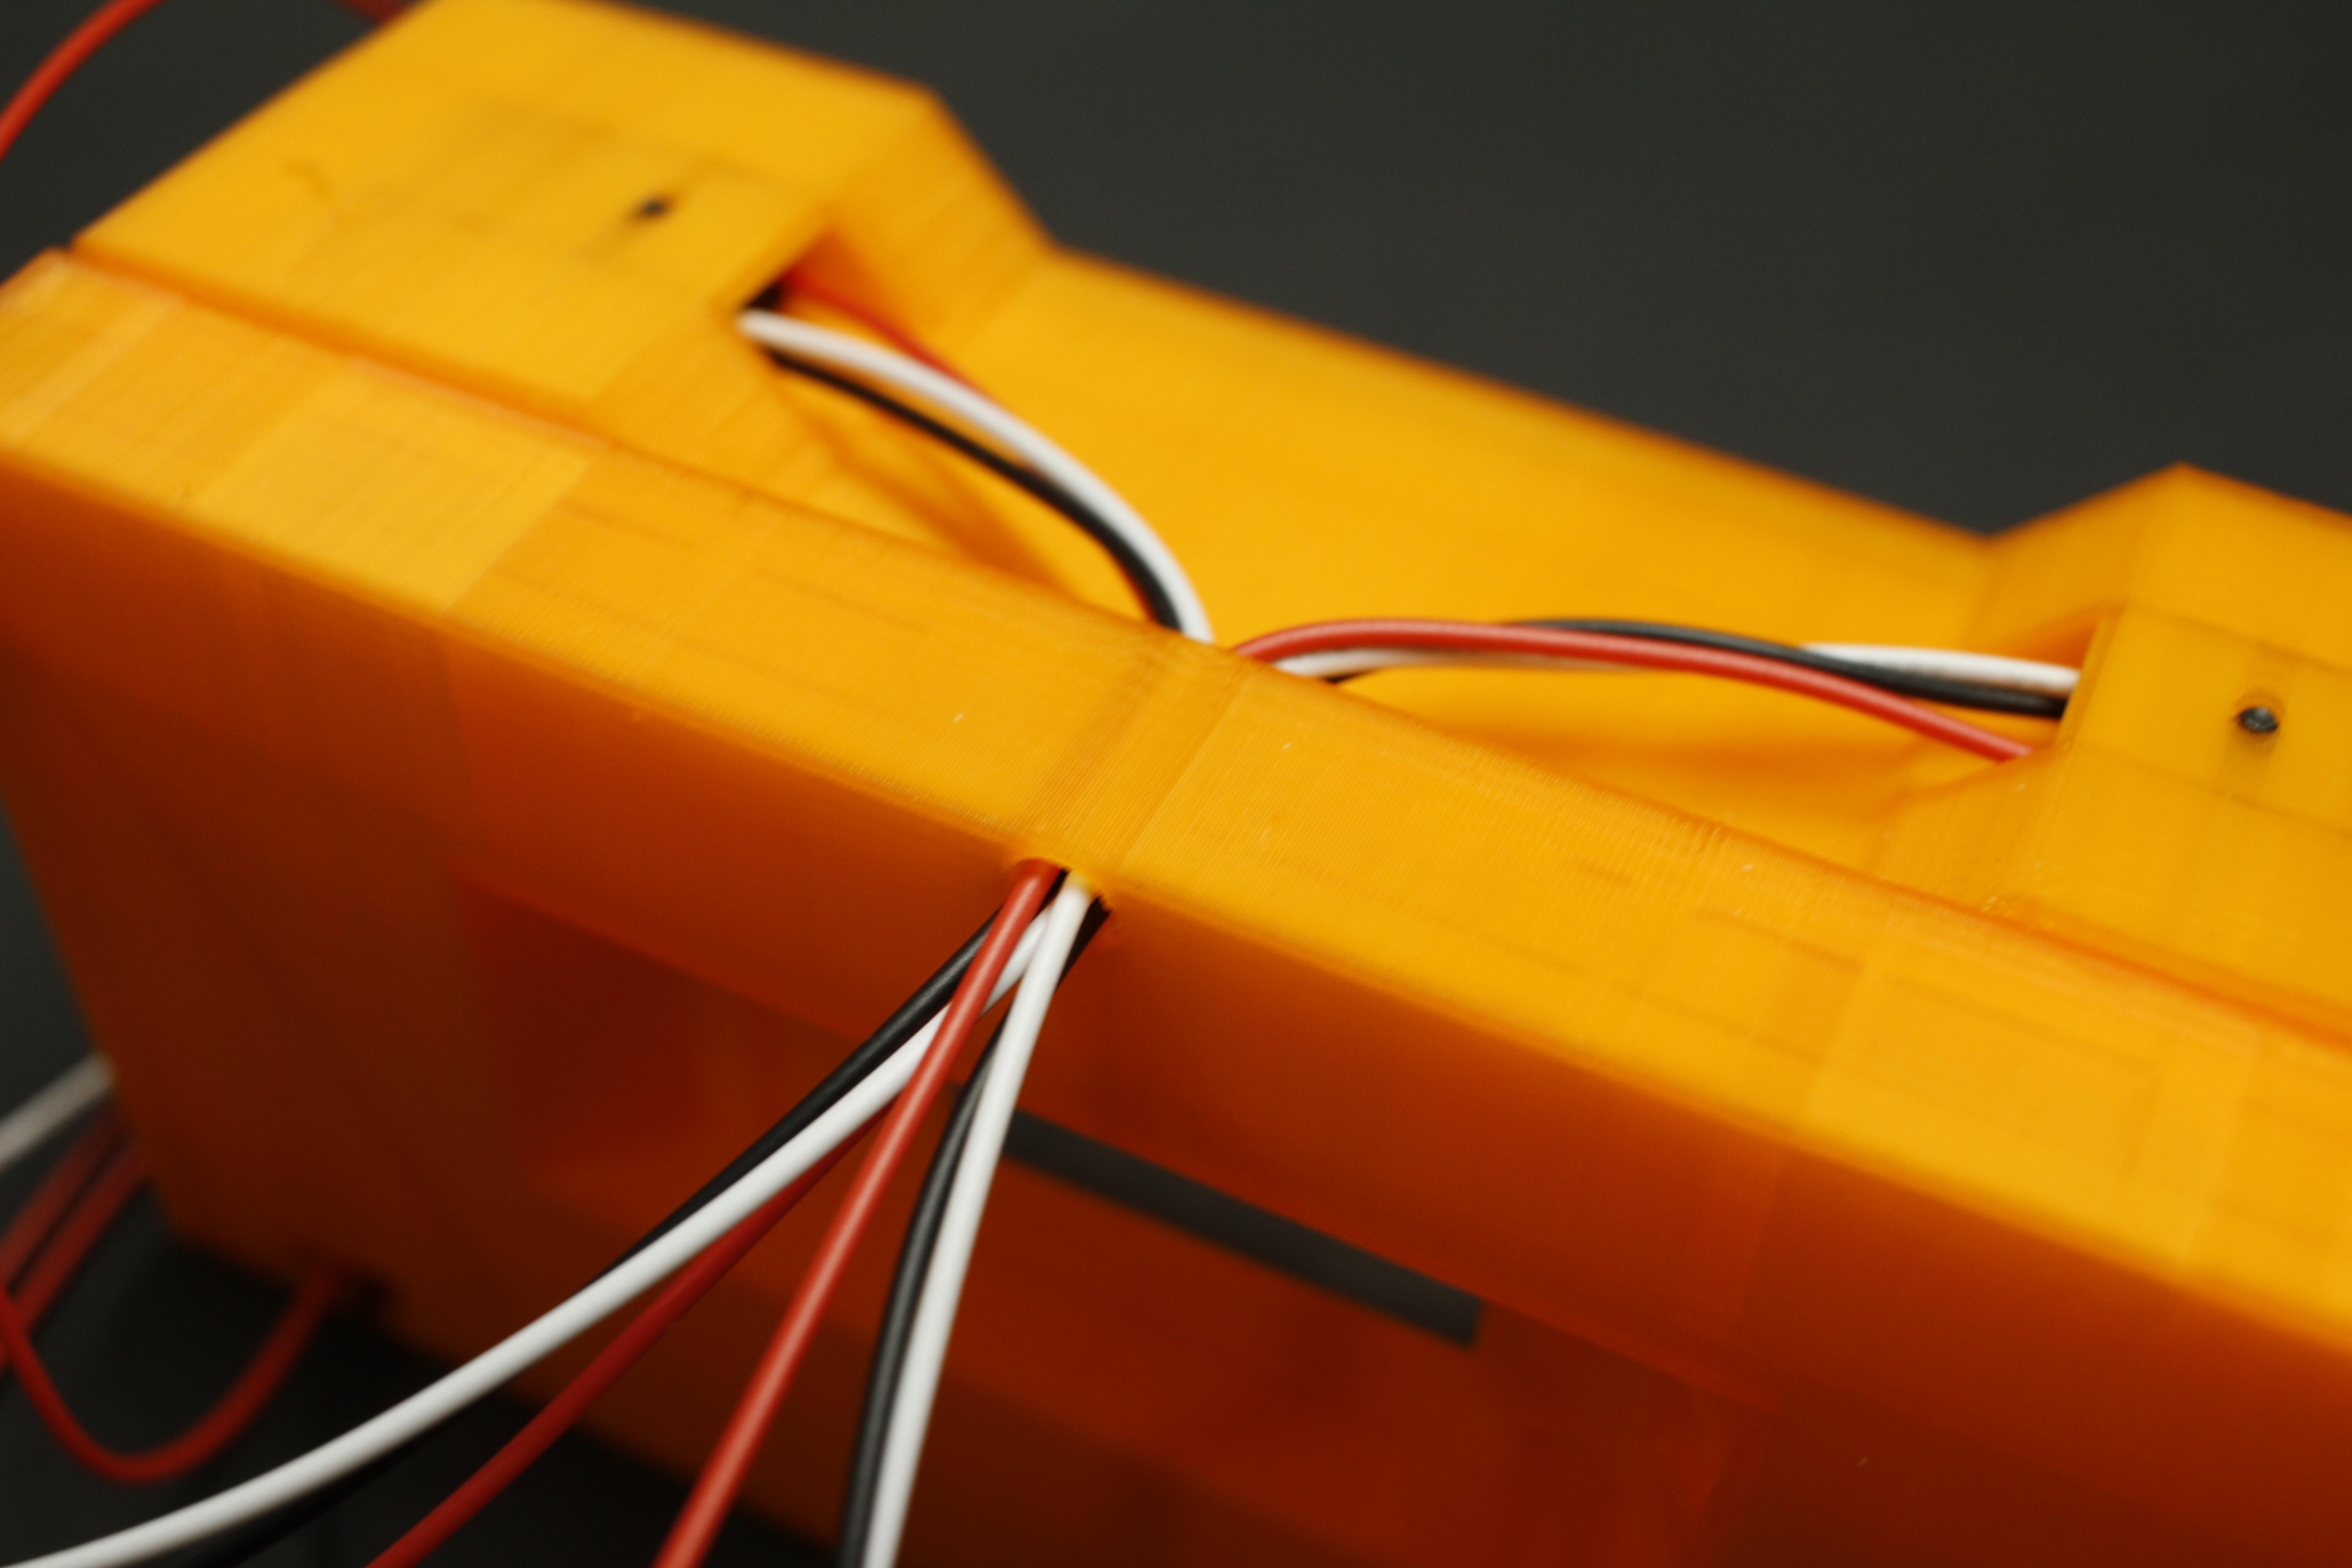 sensors__MG_9669.jpg